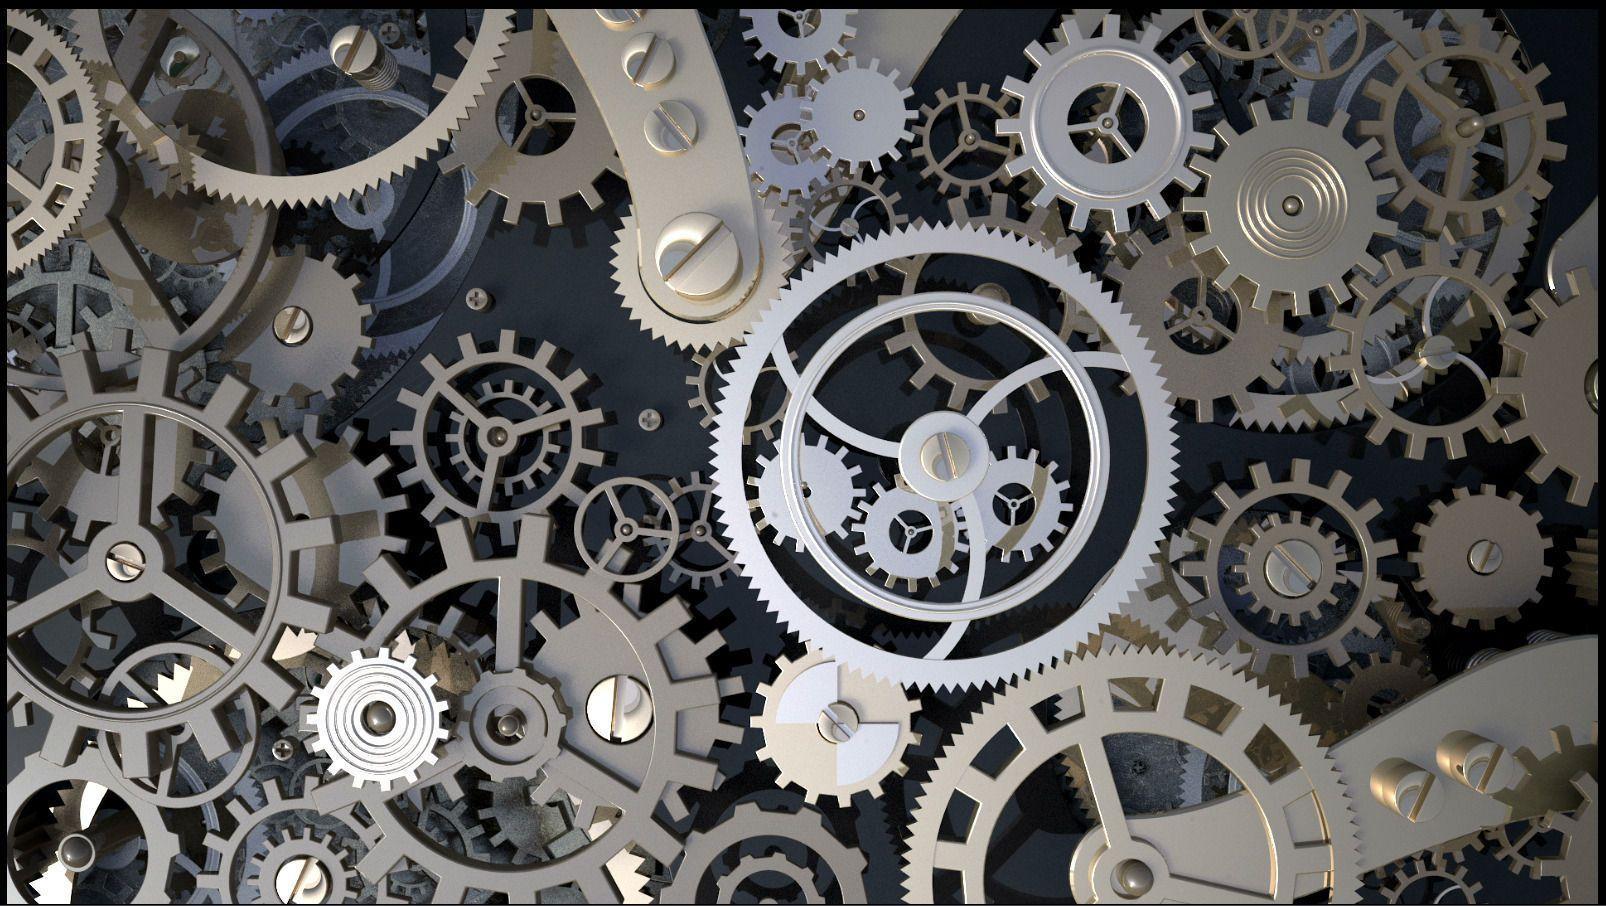 Background With Metal Cogwheels A Clockwork 3d Model Clockwork Metal Stock Images Free